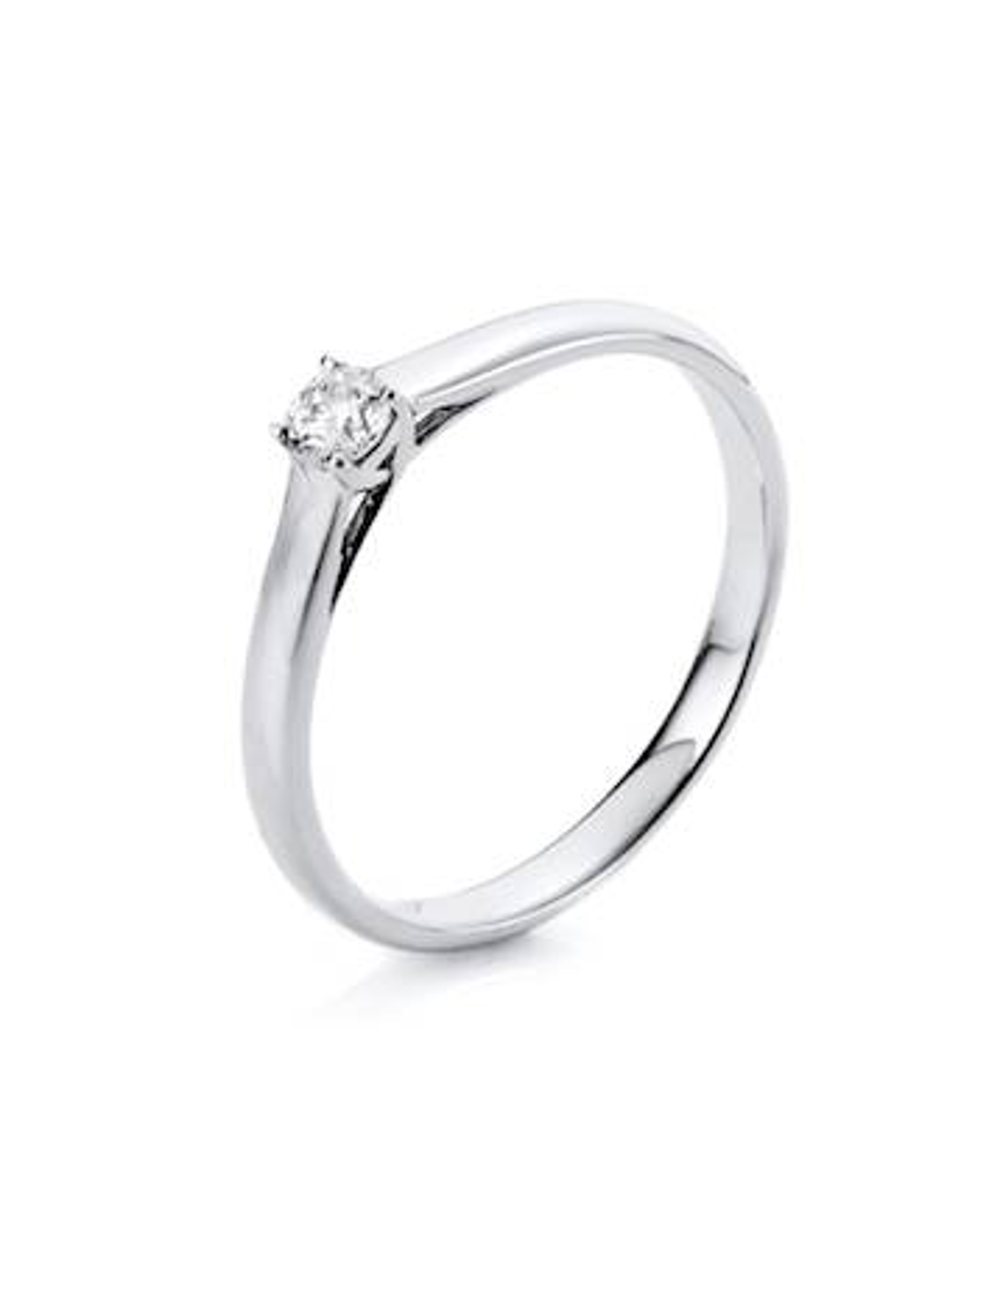 "Auksinis žiedas su briliantu ""Deimantukas"""